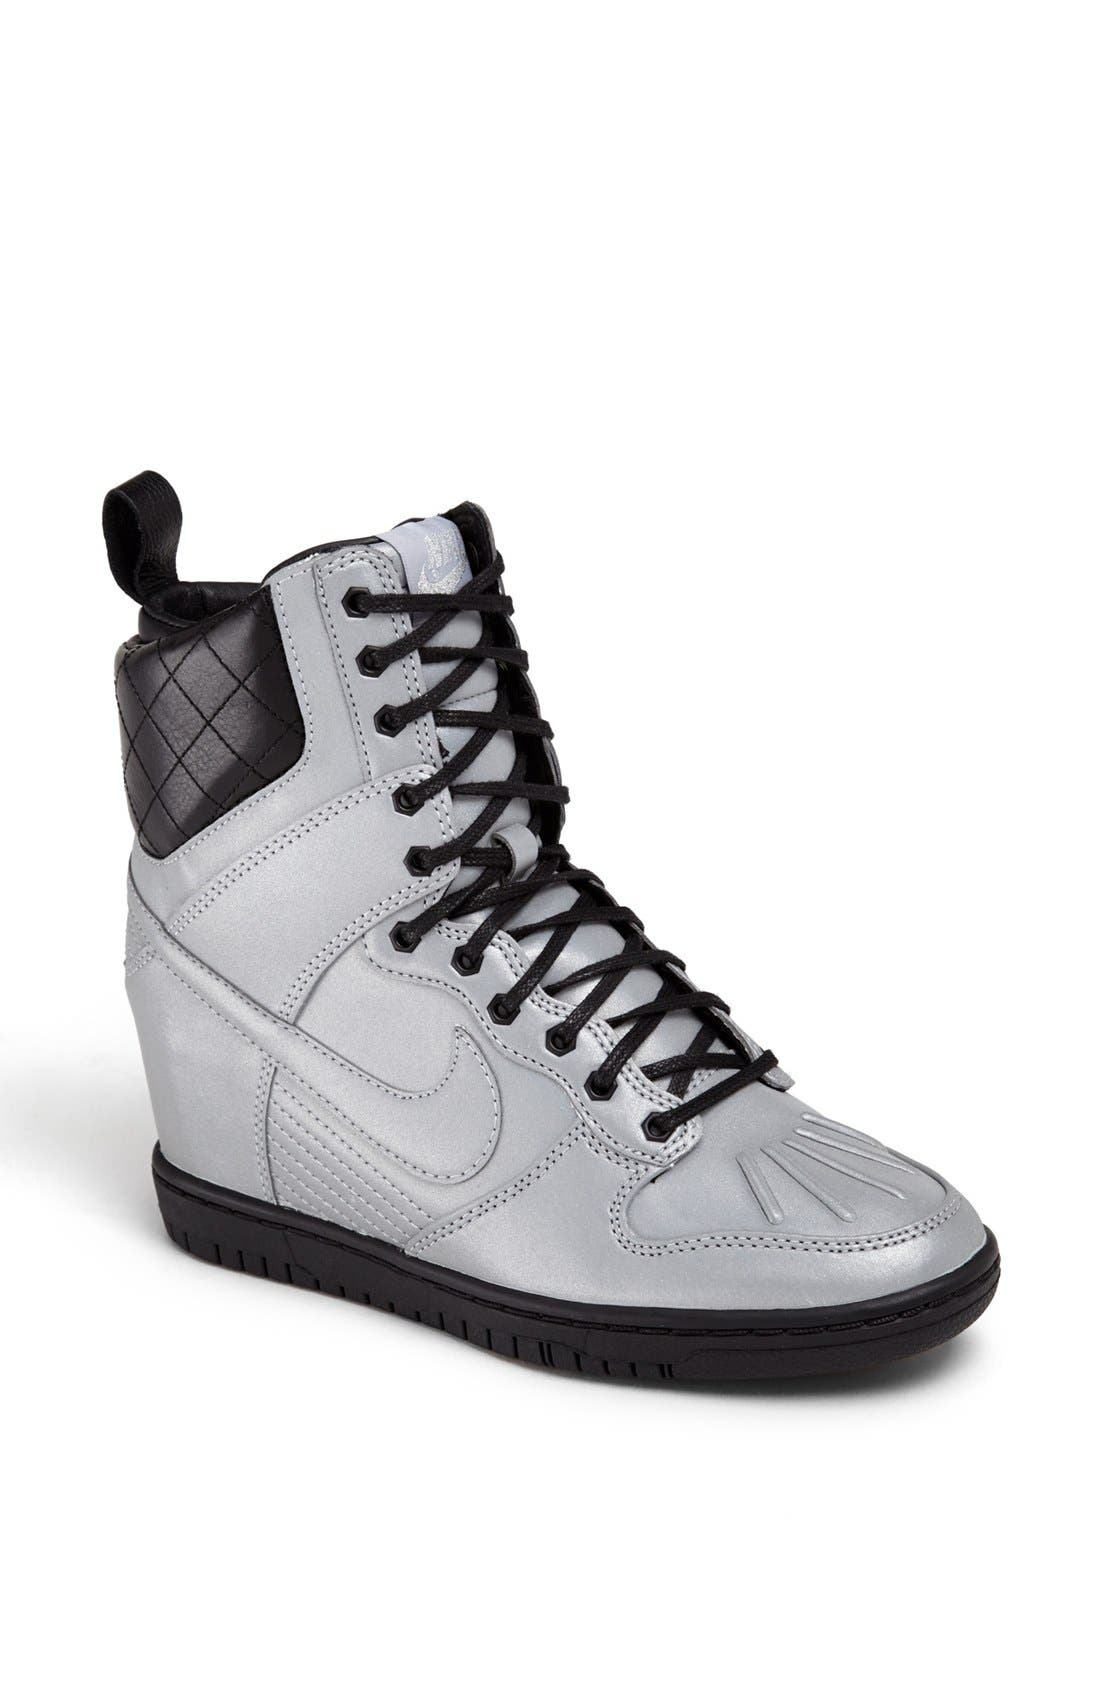 Alternate Image 1 Selected - Nike 'Dunk Sky Hi' Hidden Wedge Sneaker Boot (Women)